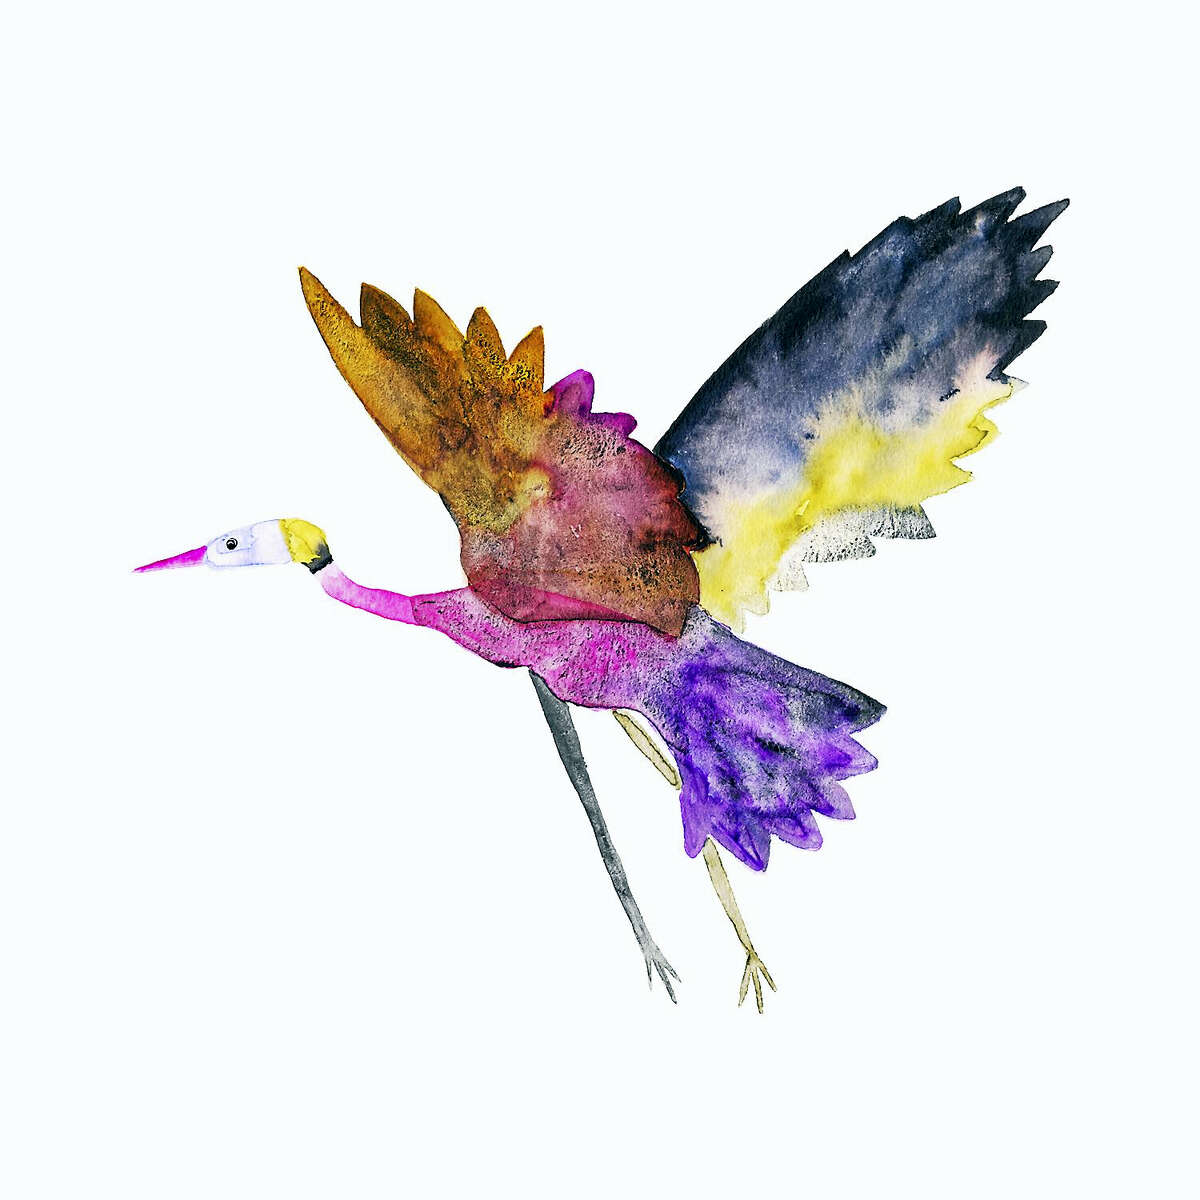 Heron, by Sarah Martinez.